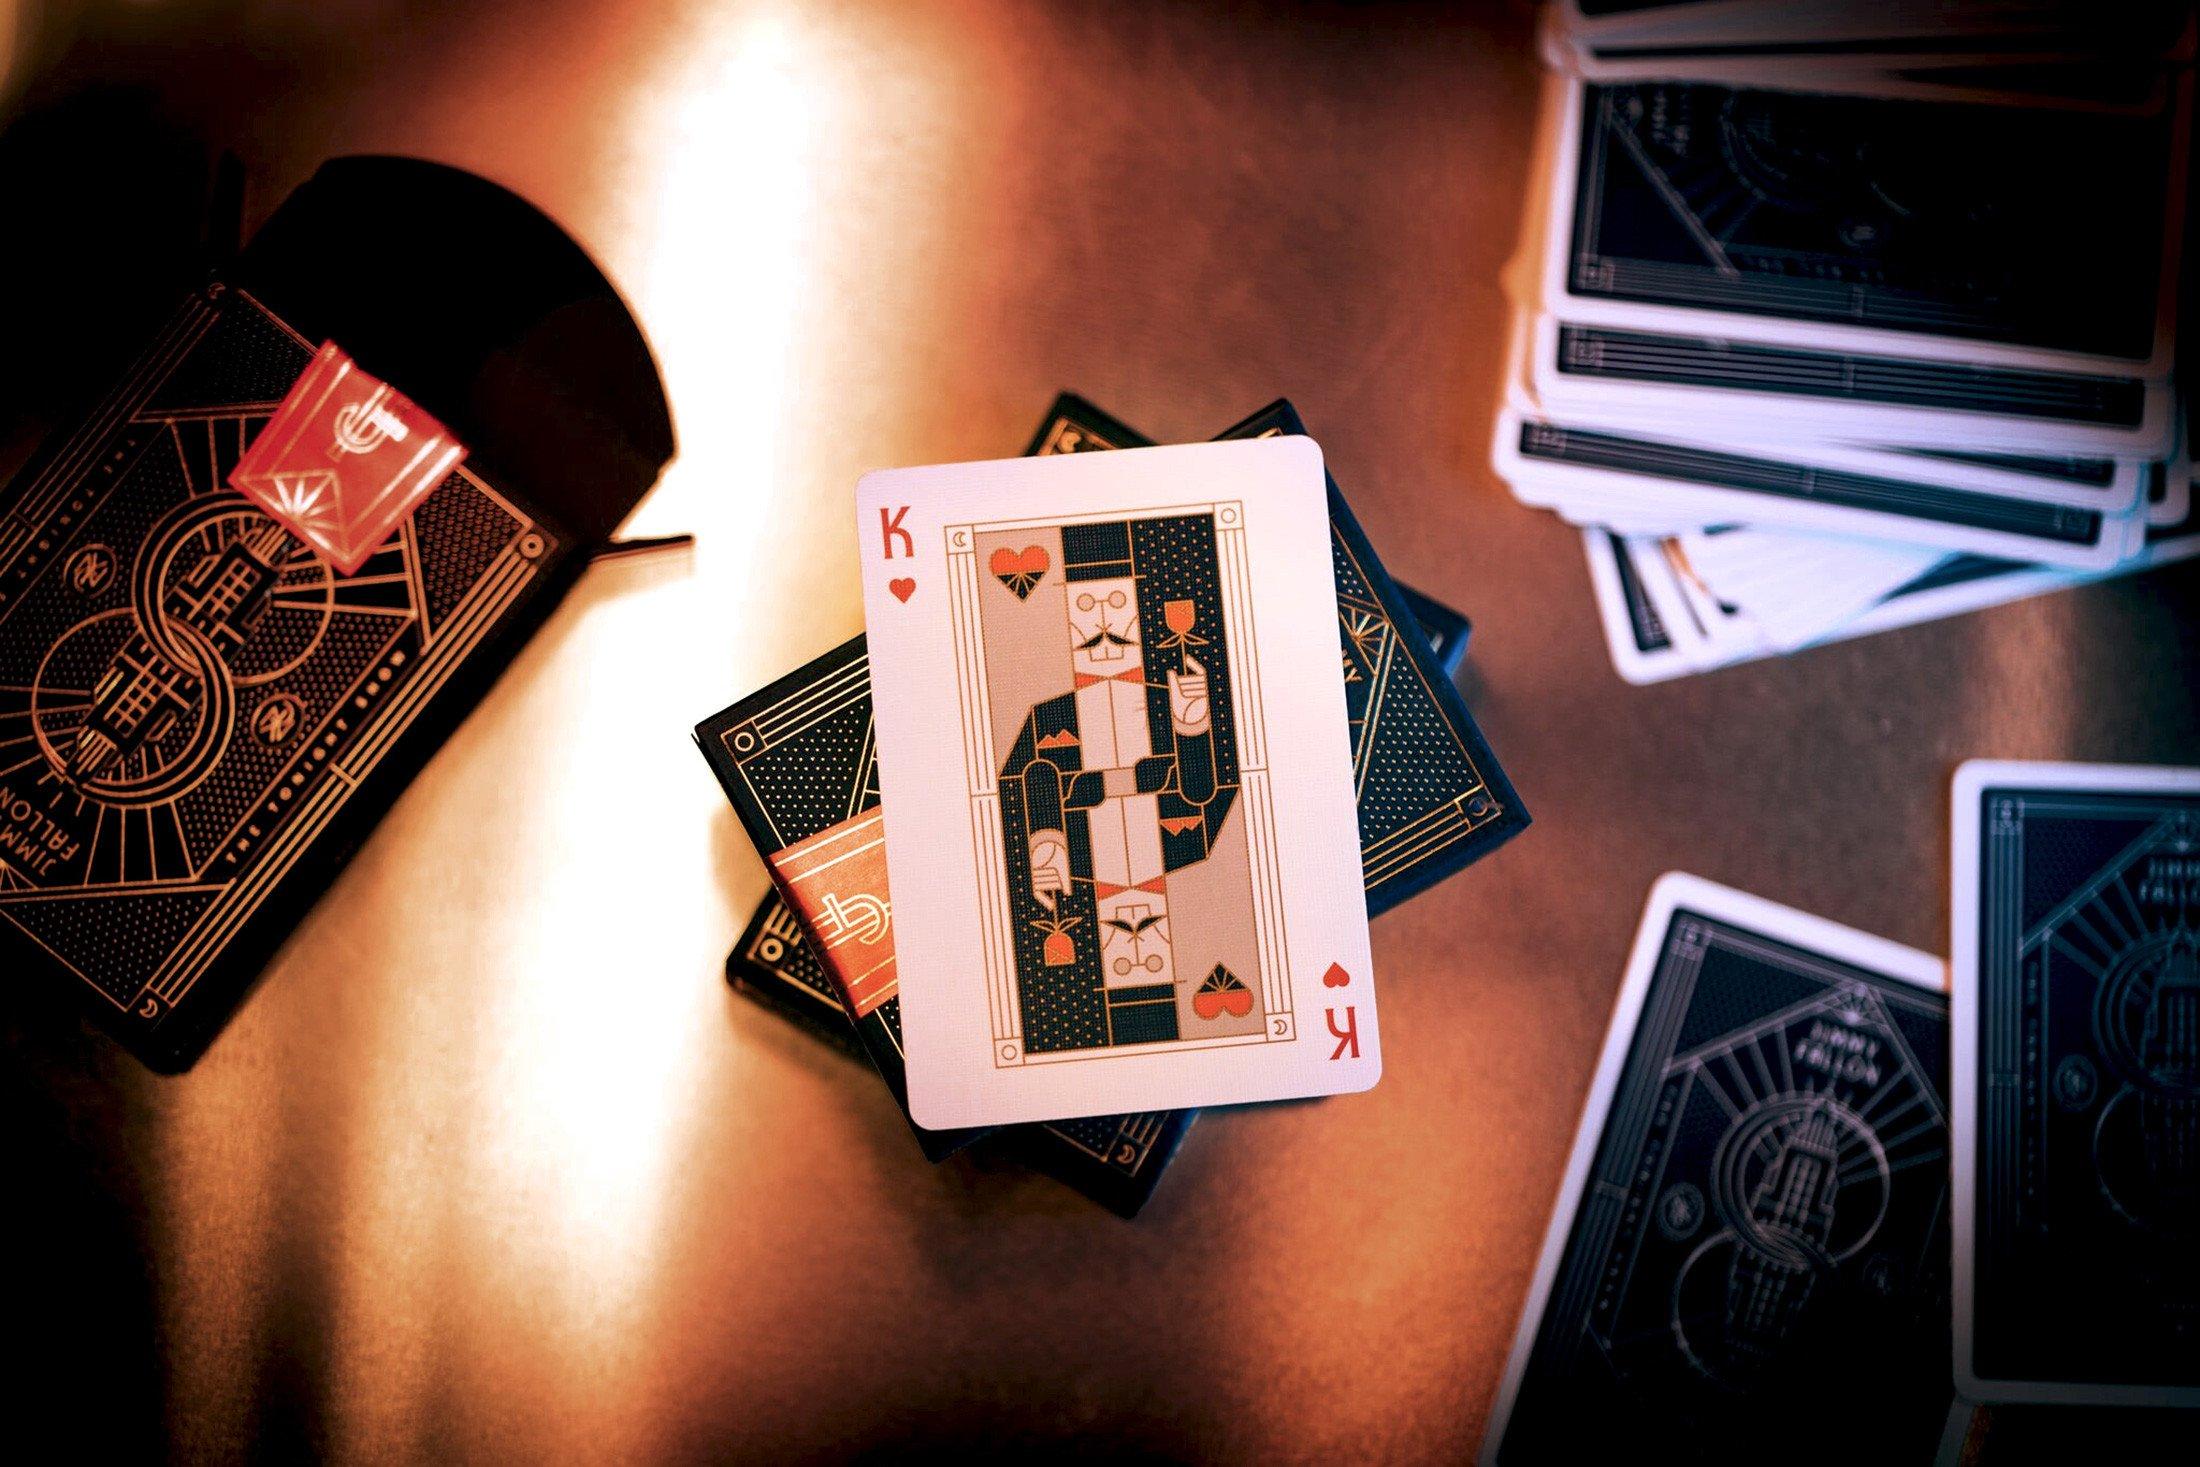 jimmy-fallon-playing-cards-04.jpg